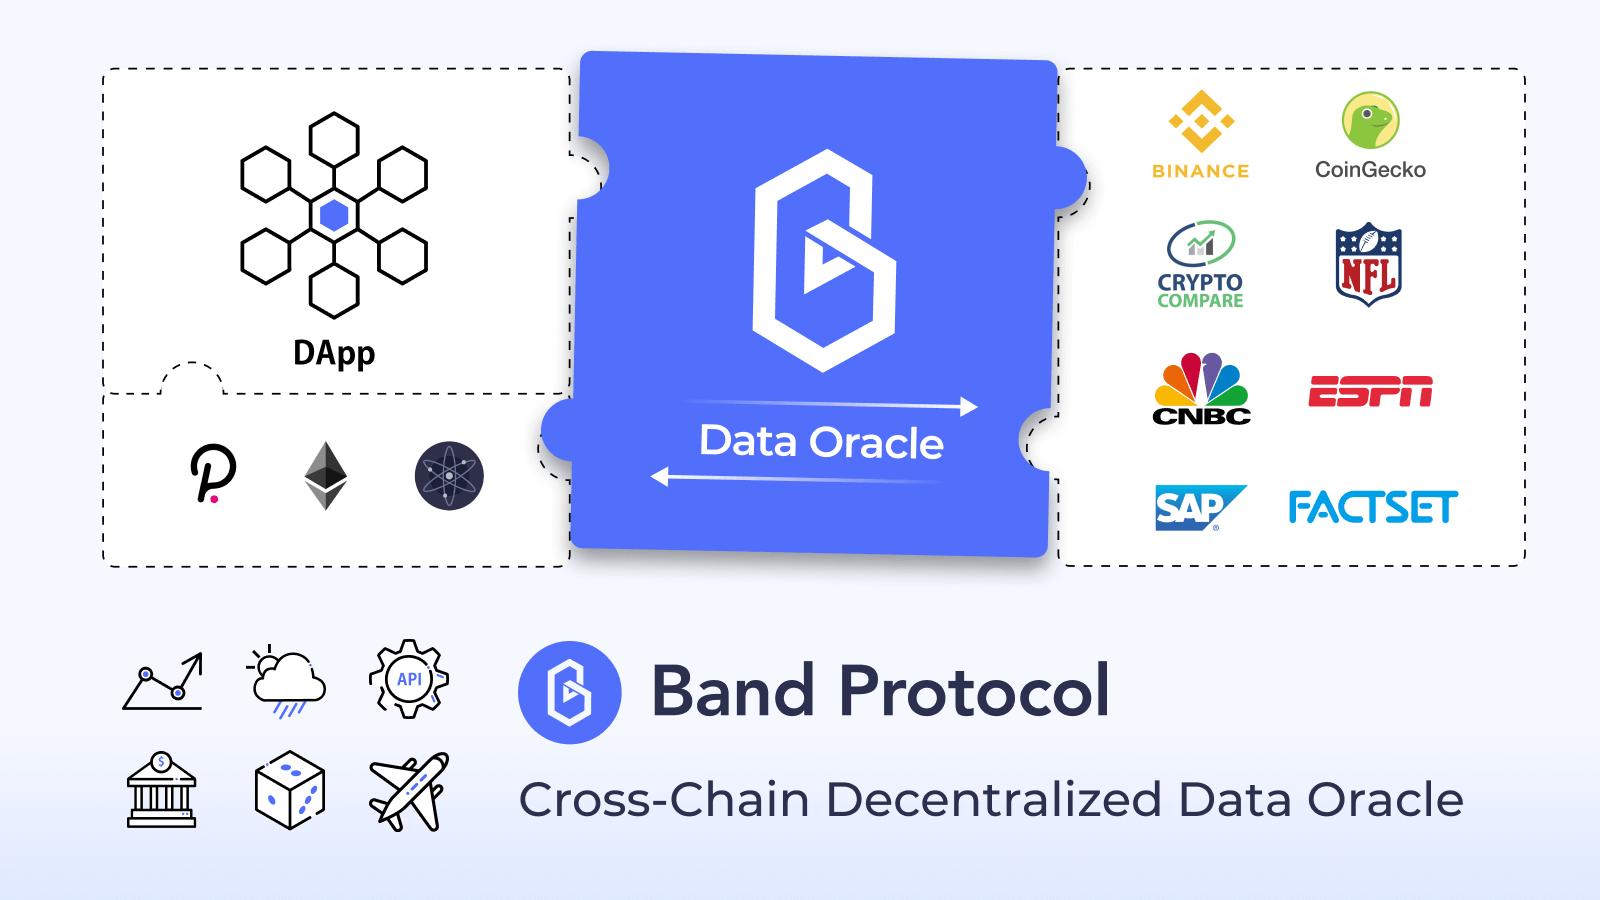 Band Protocol (BAND) Coin